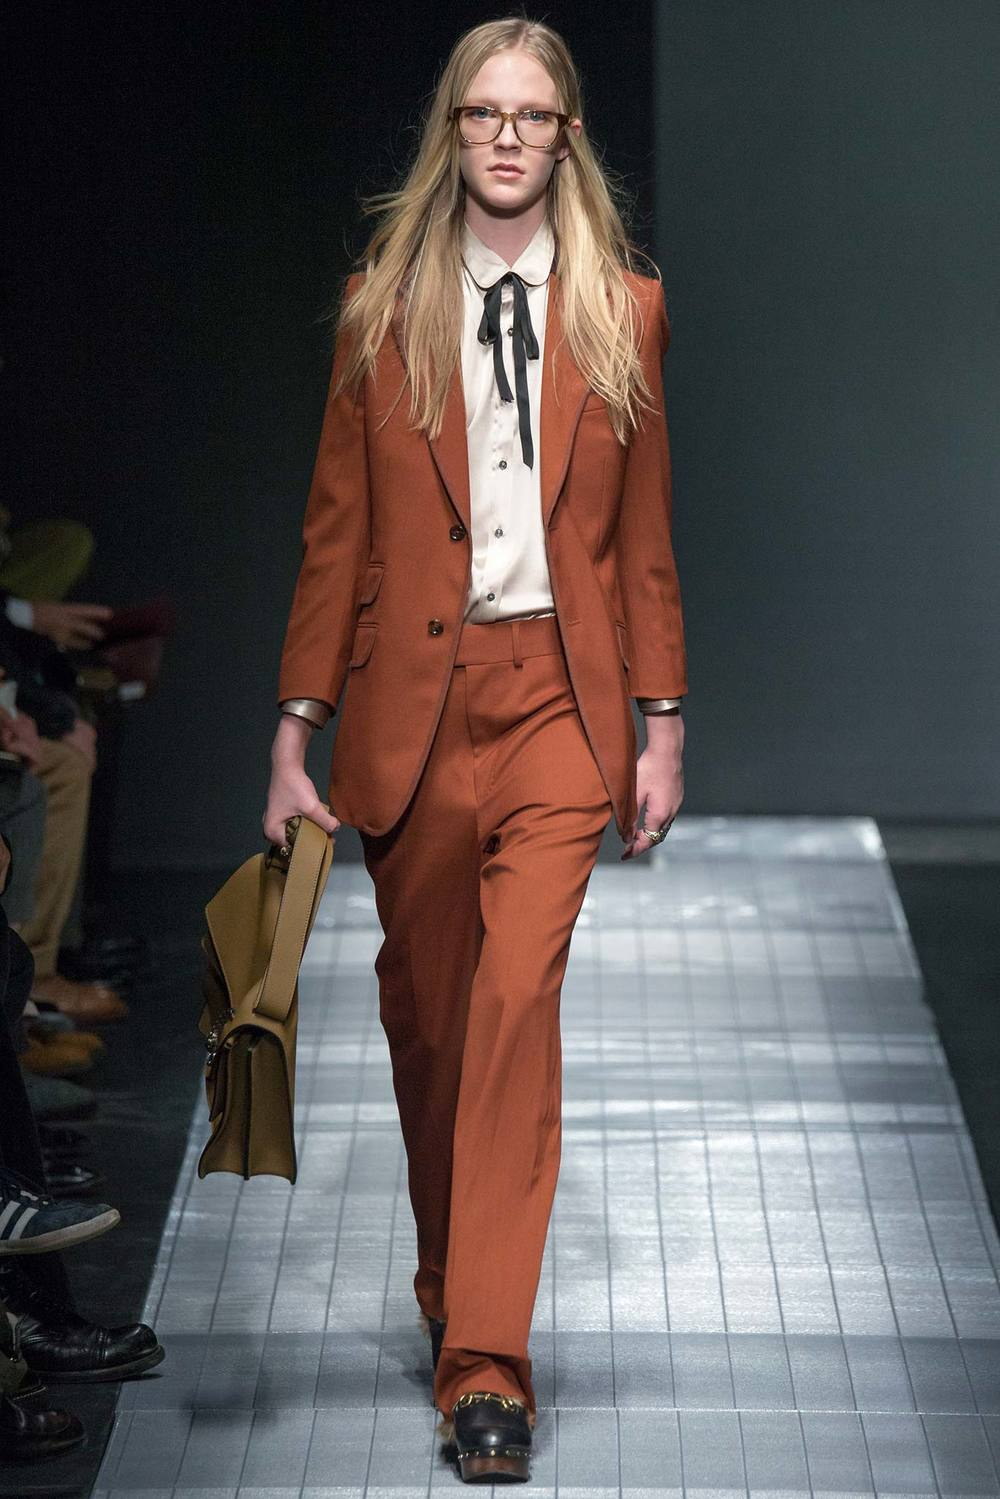 Gucci-Menswear-FW-2015-Milan-4.jpg